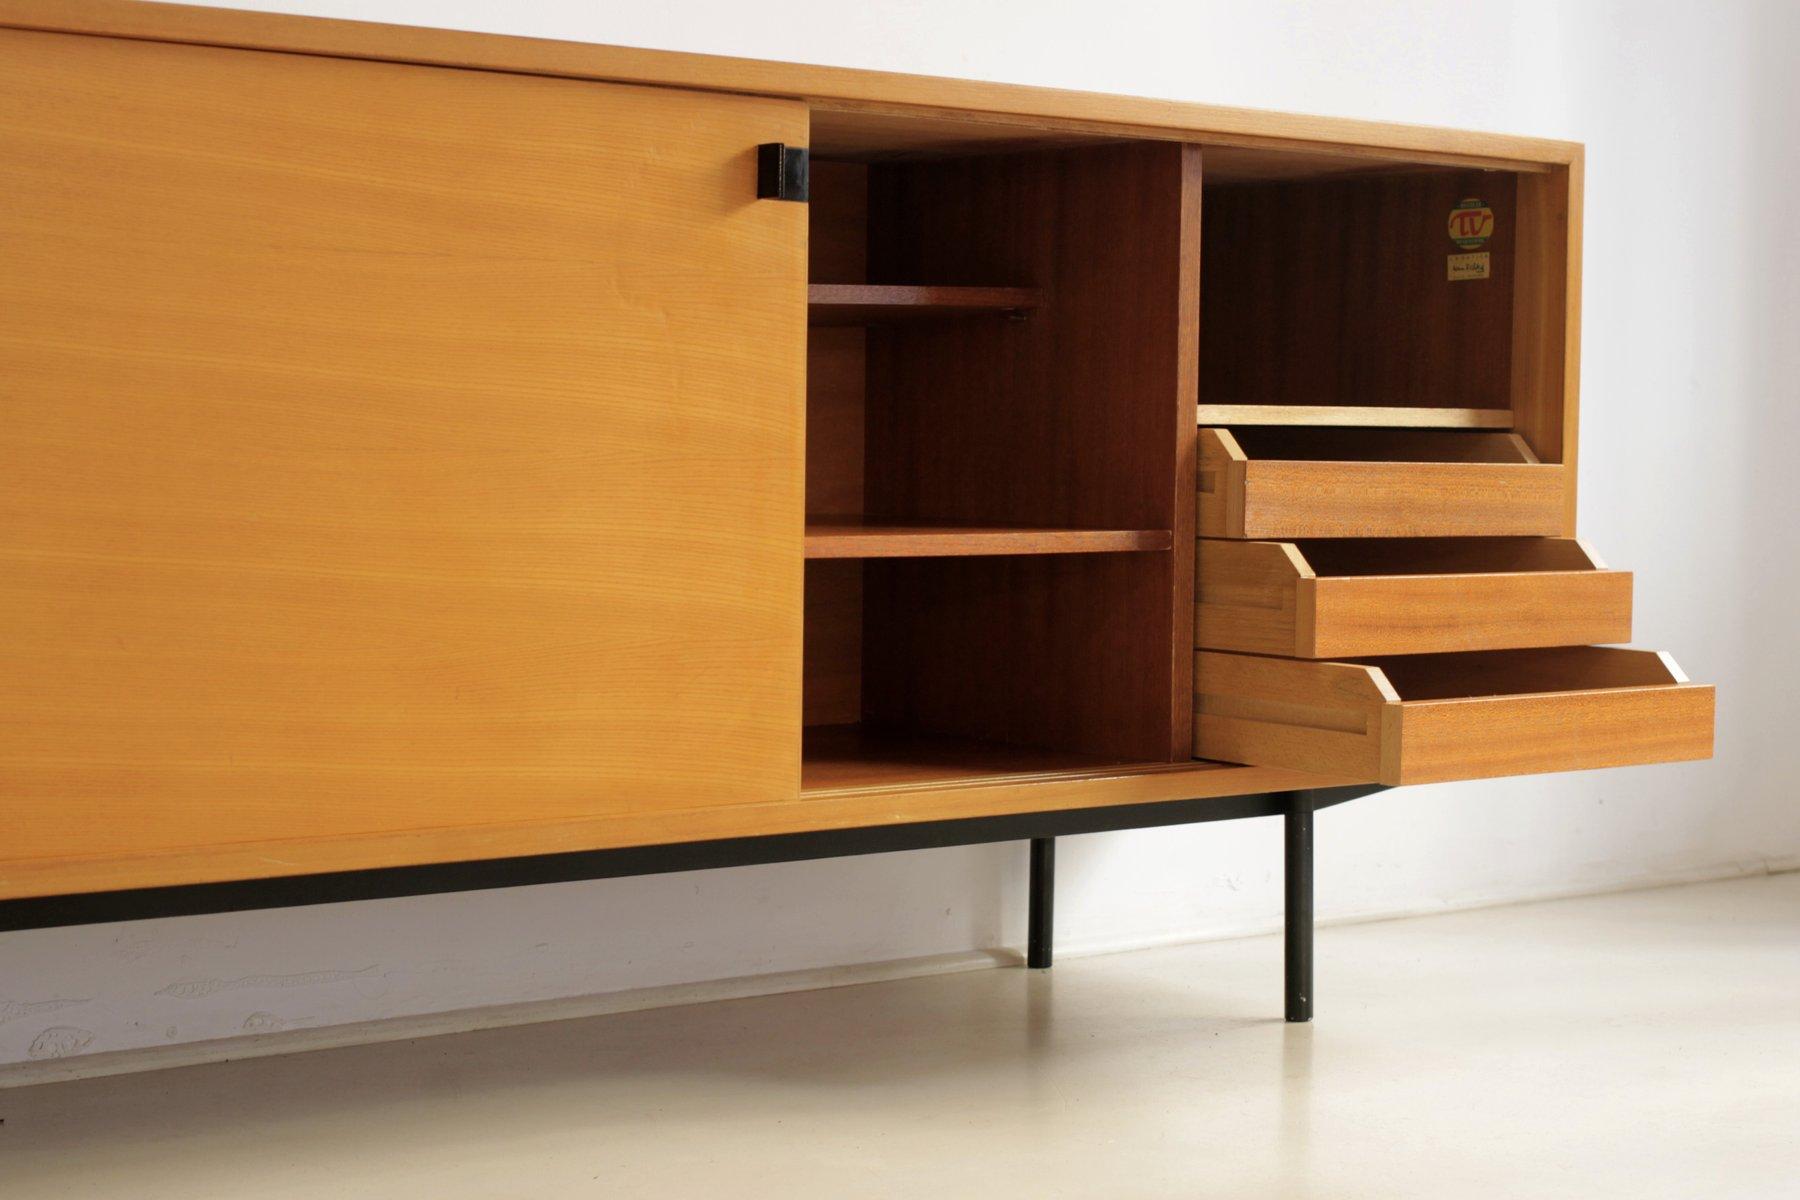 franz sisches sideboard von alain richard f r meubles tv. Black Bedroom Furniture Sets. Home Design Ideas